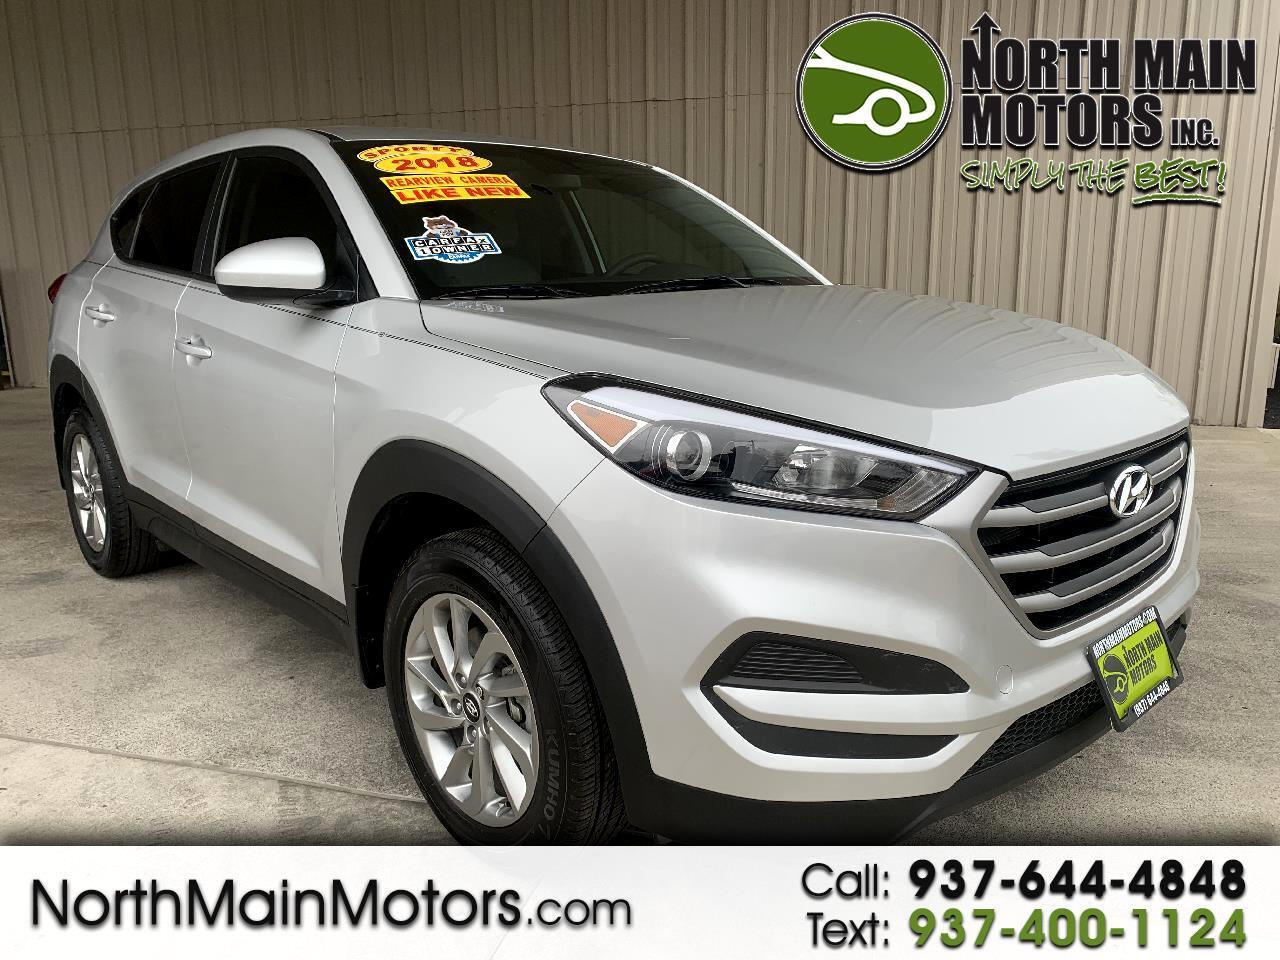 Hyundai Tucson SE FWD 2018